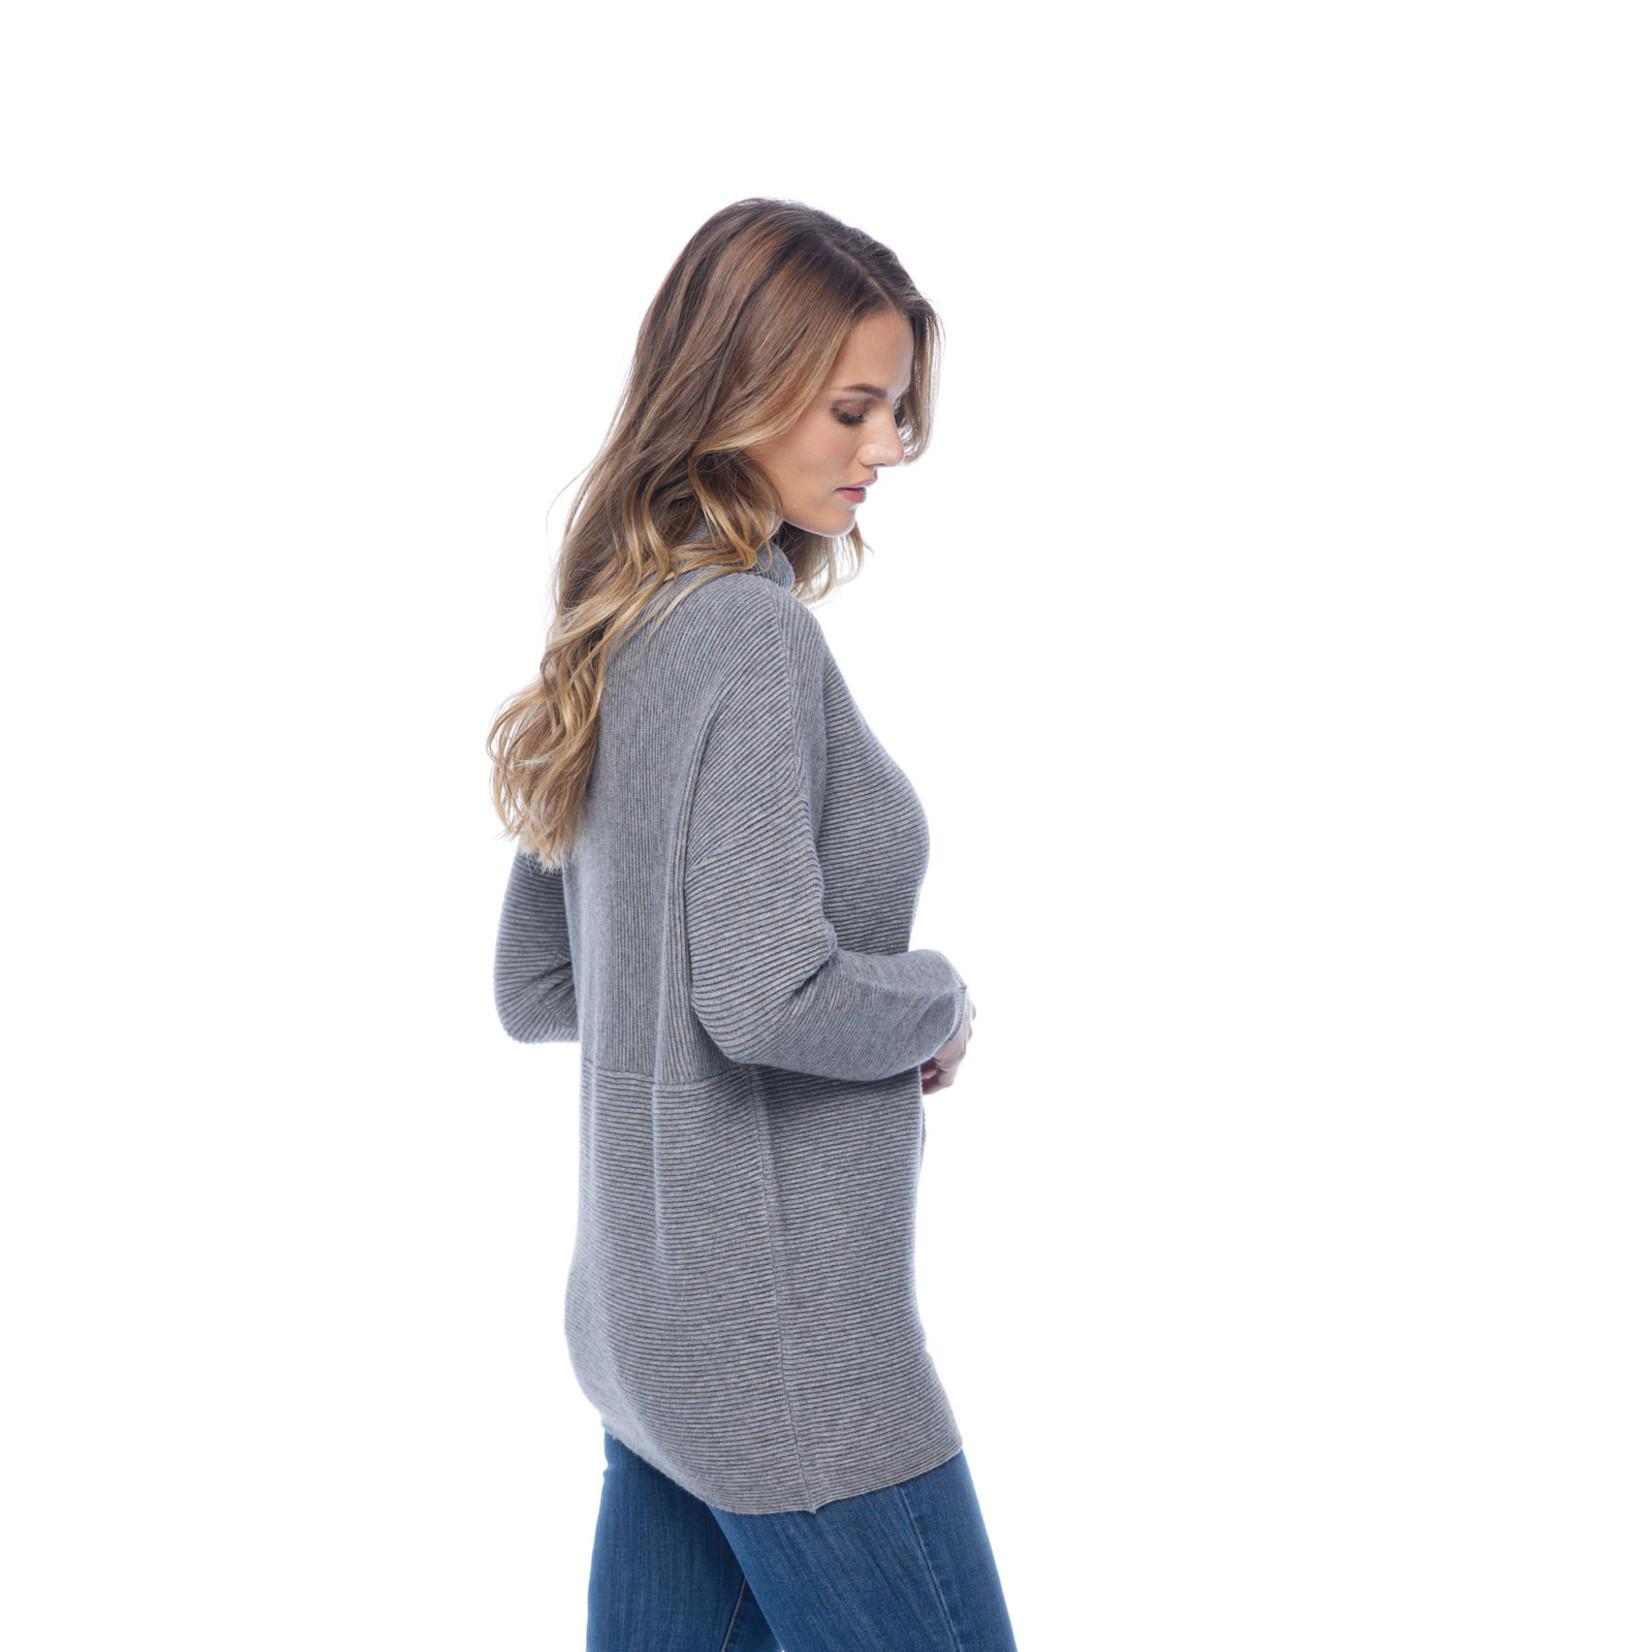 FDJ Heather Sweater Knit Top in Gray/Blue